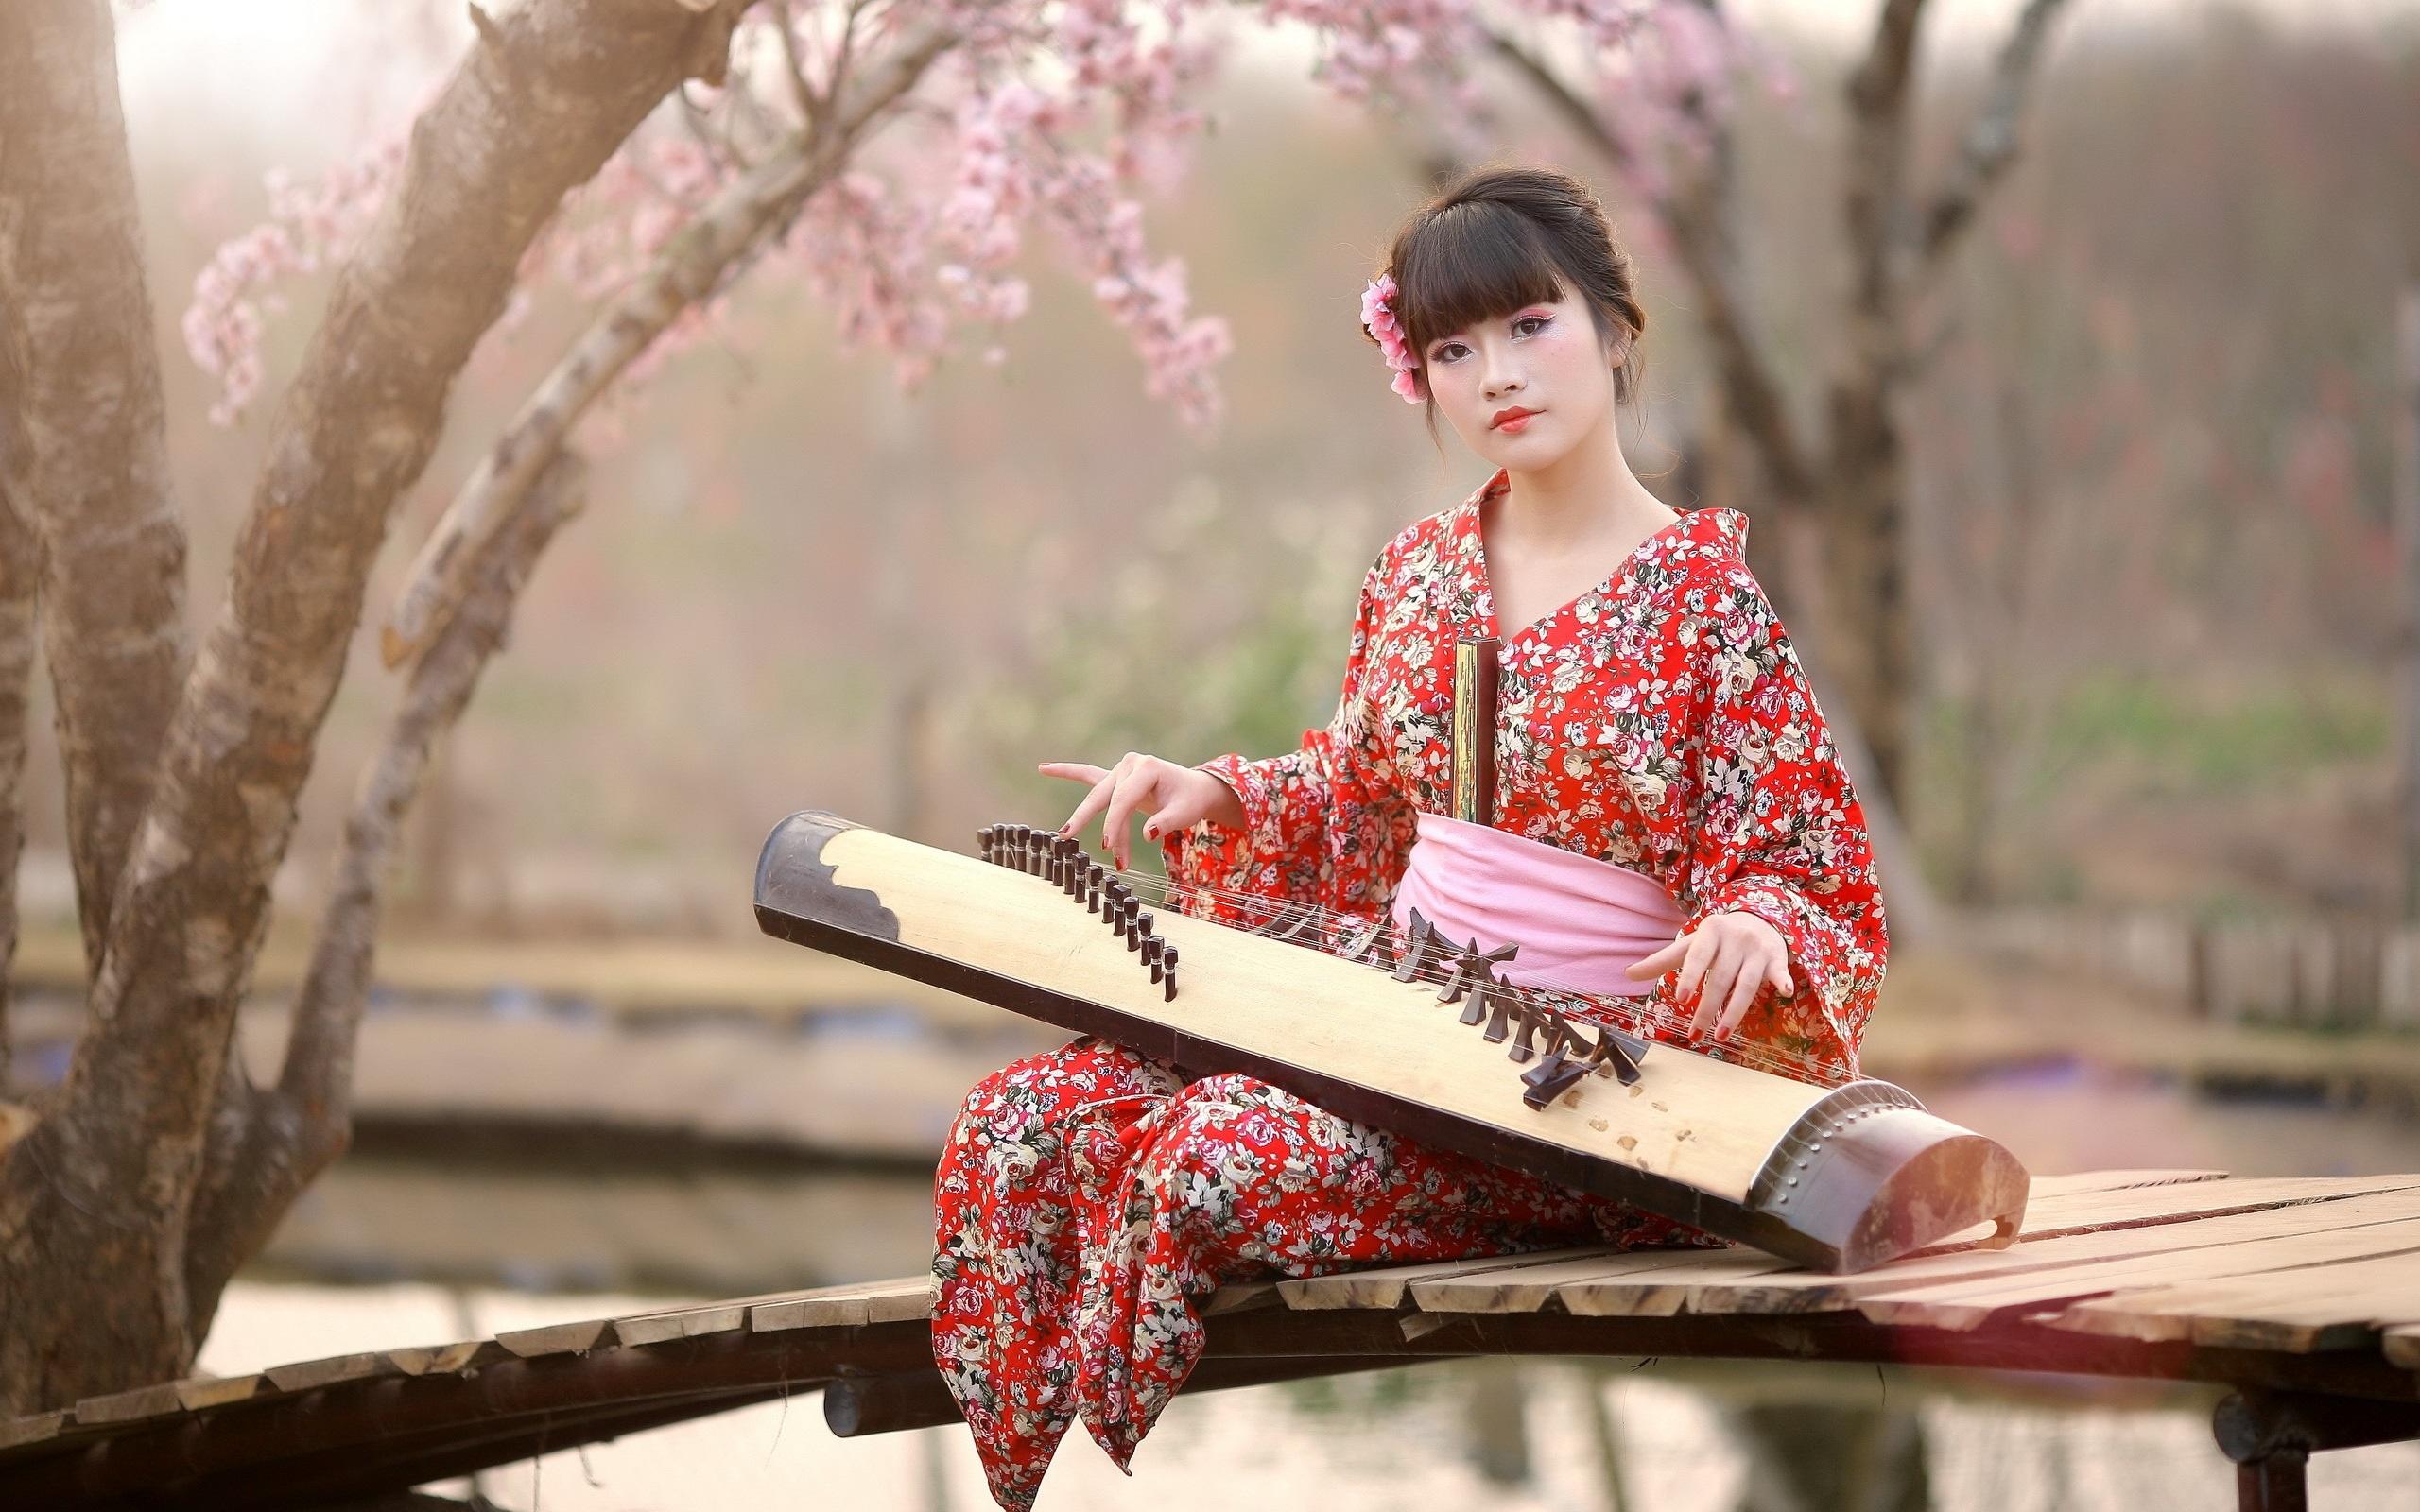 wallpaper japan, girl, kimono, music 2560x1600 hd picture, image